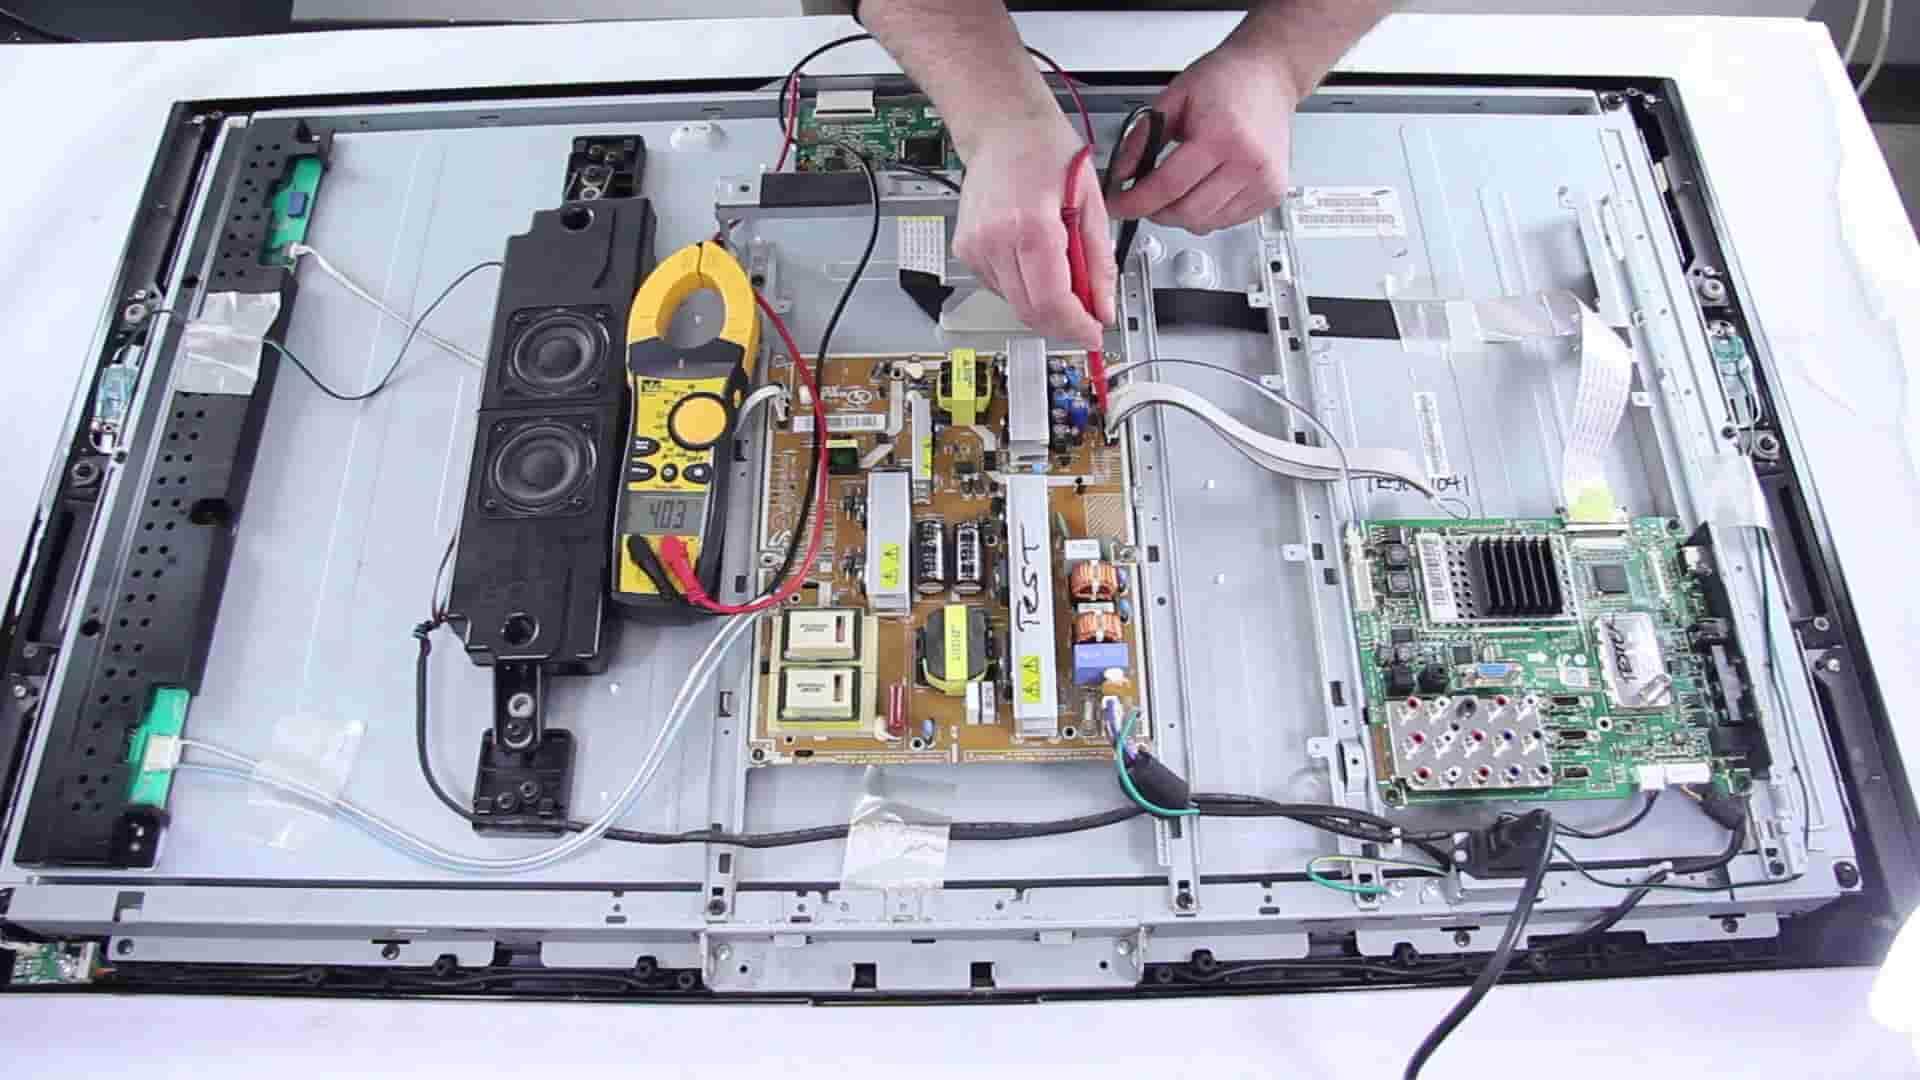 Lcd Led Smart Tv Repairing Course Institute Delhi Wiring Diagram For